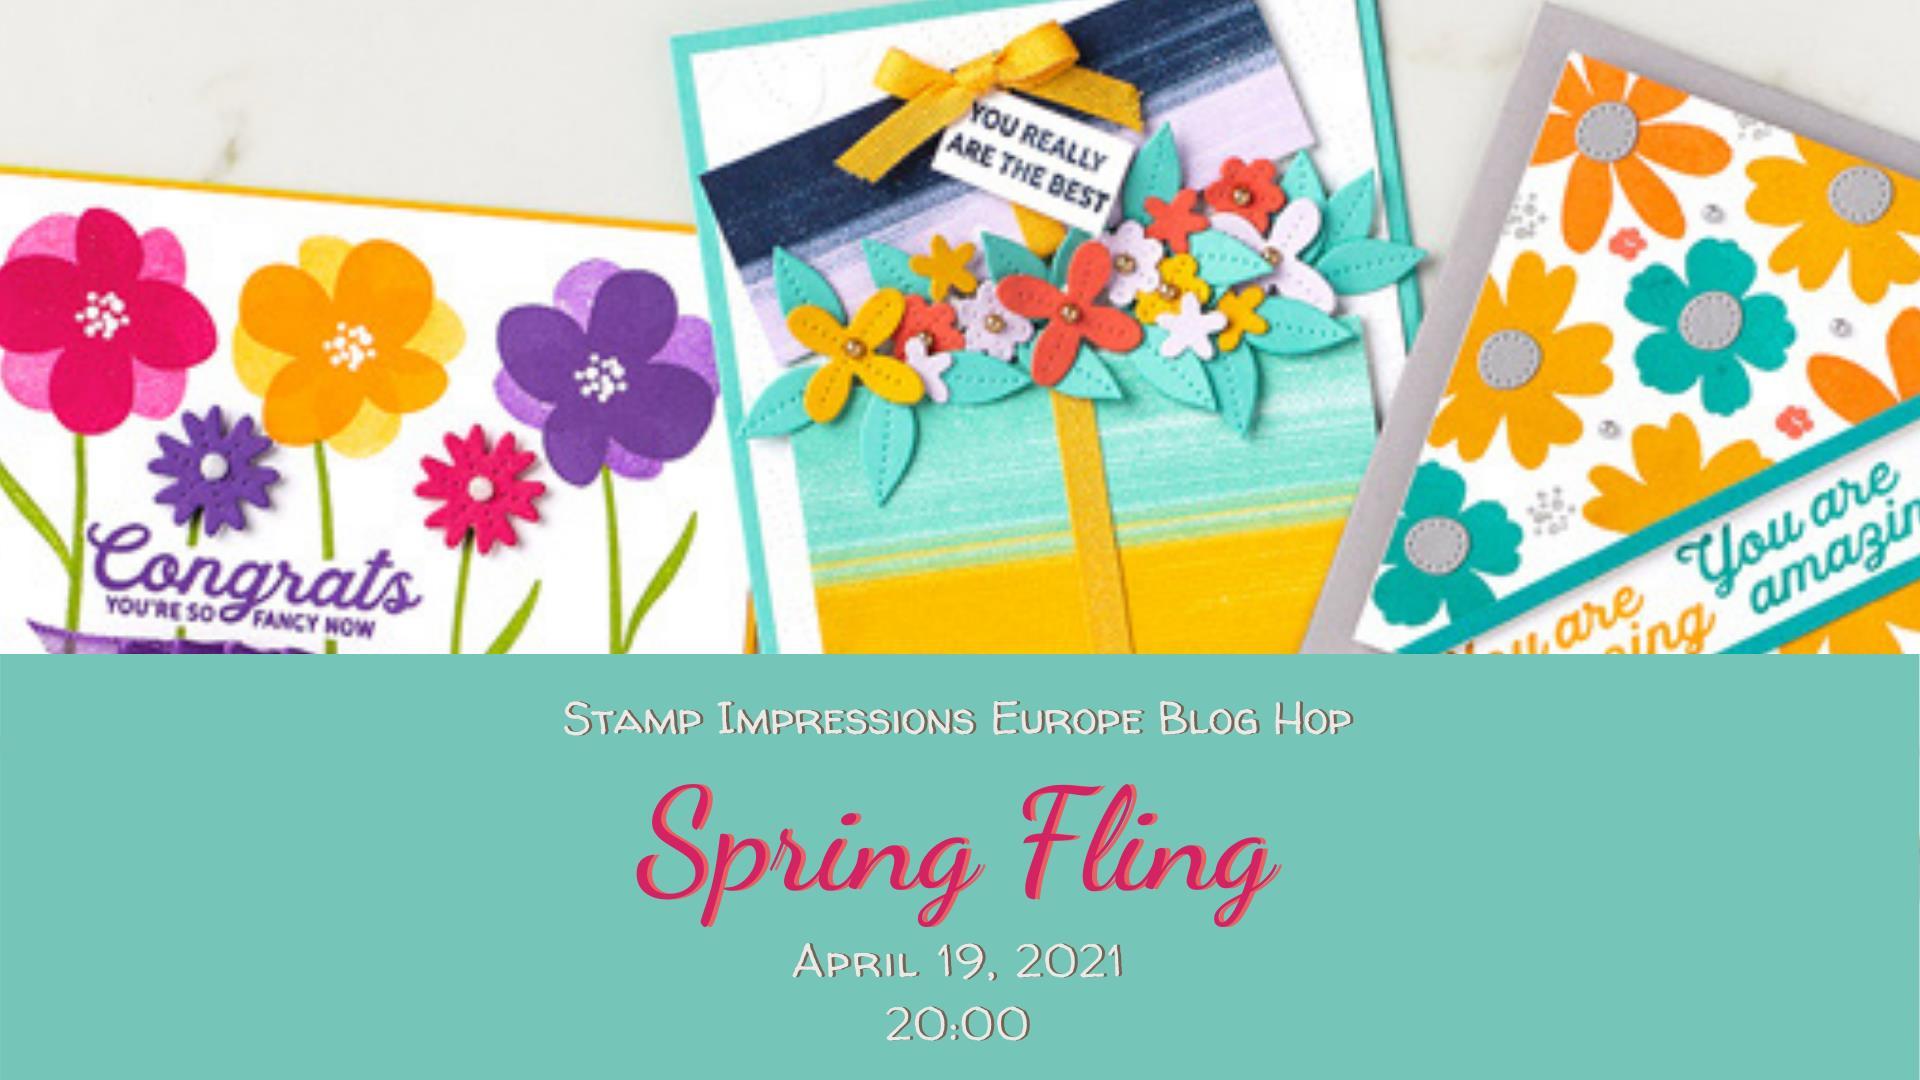 spring fling, blog hop, stampin treasure, stampin up